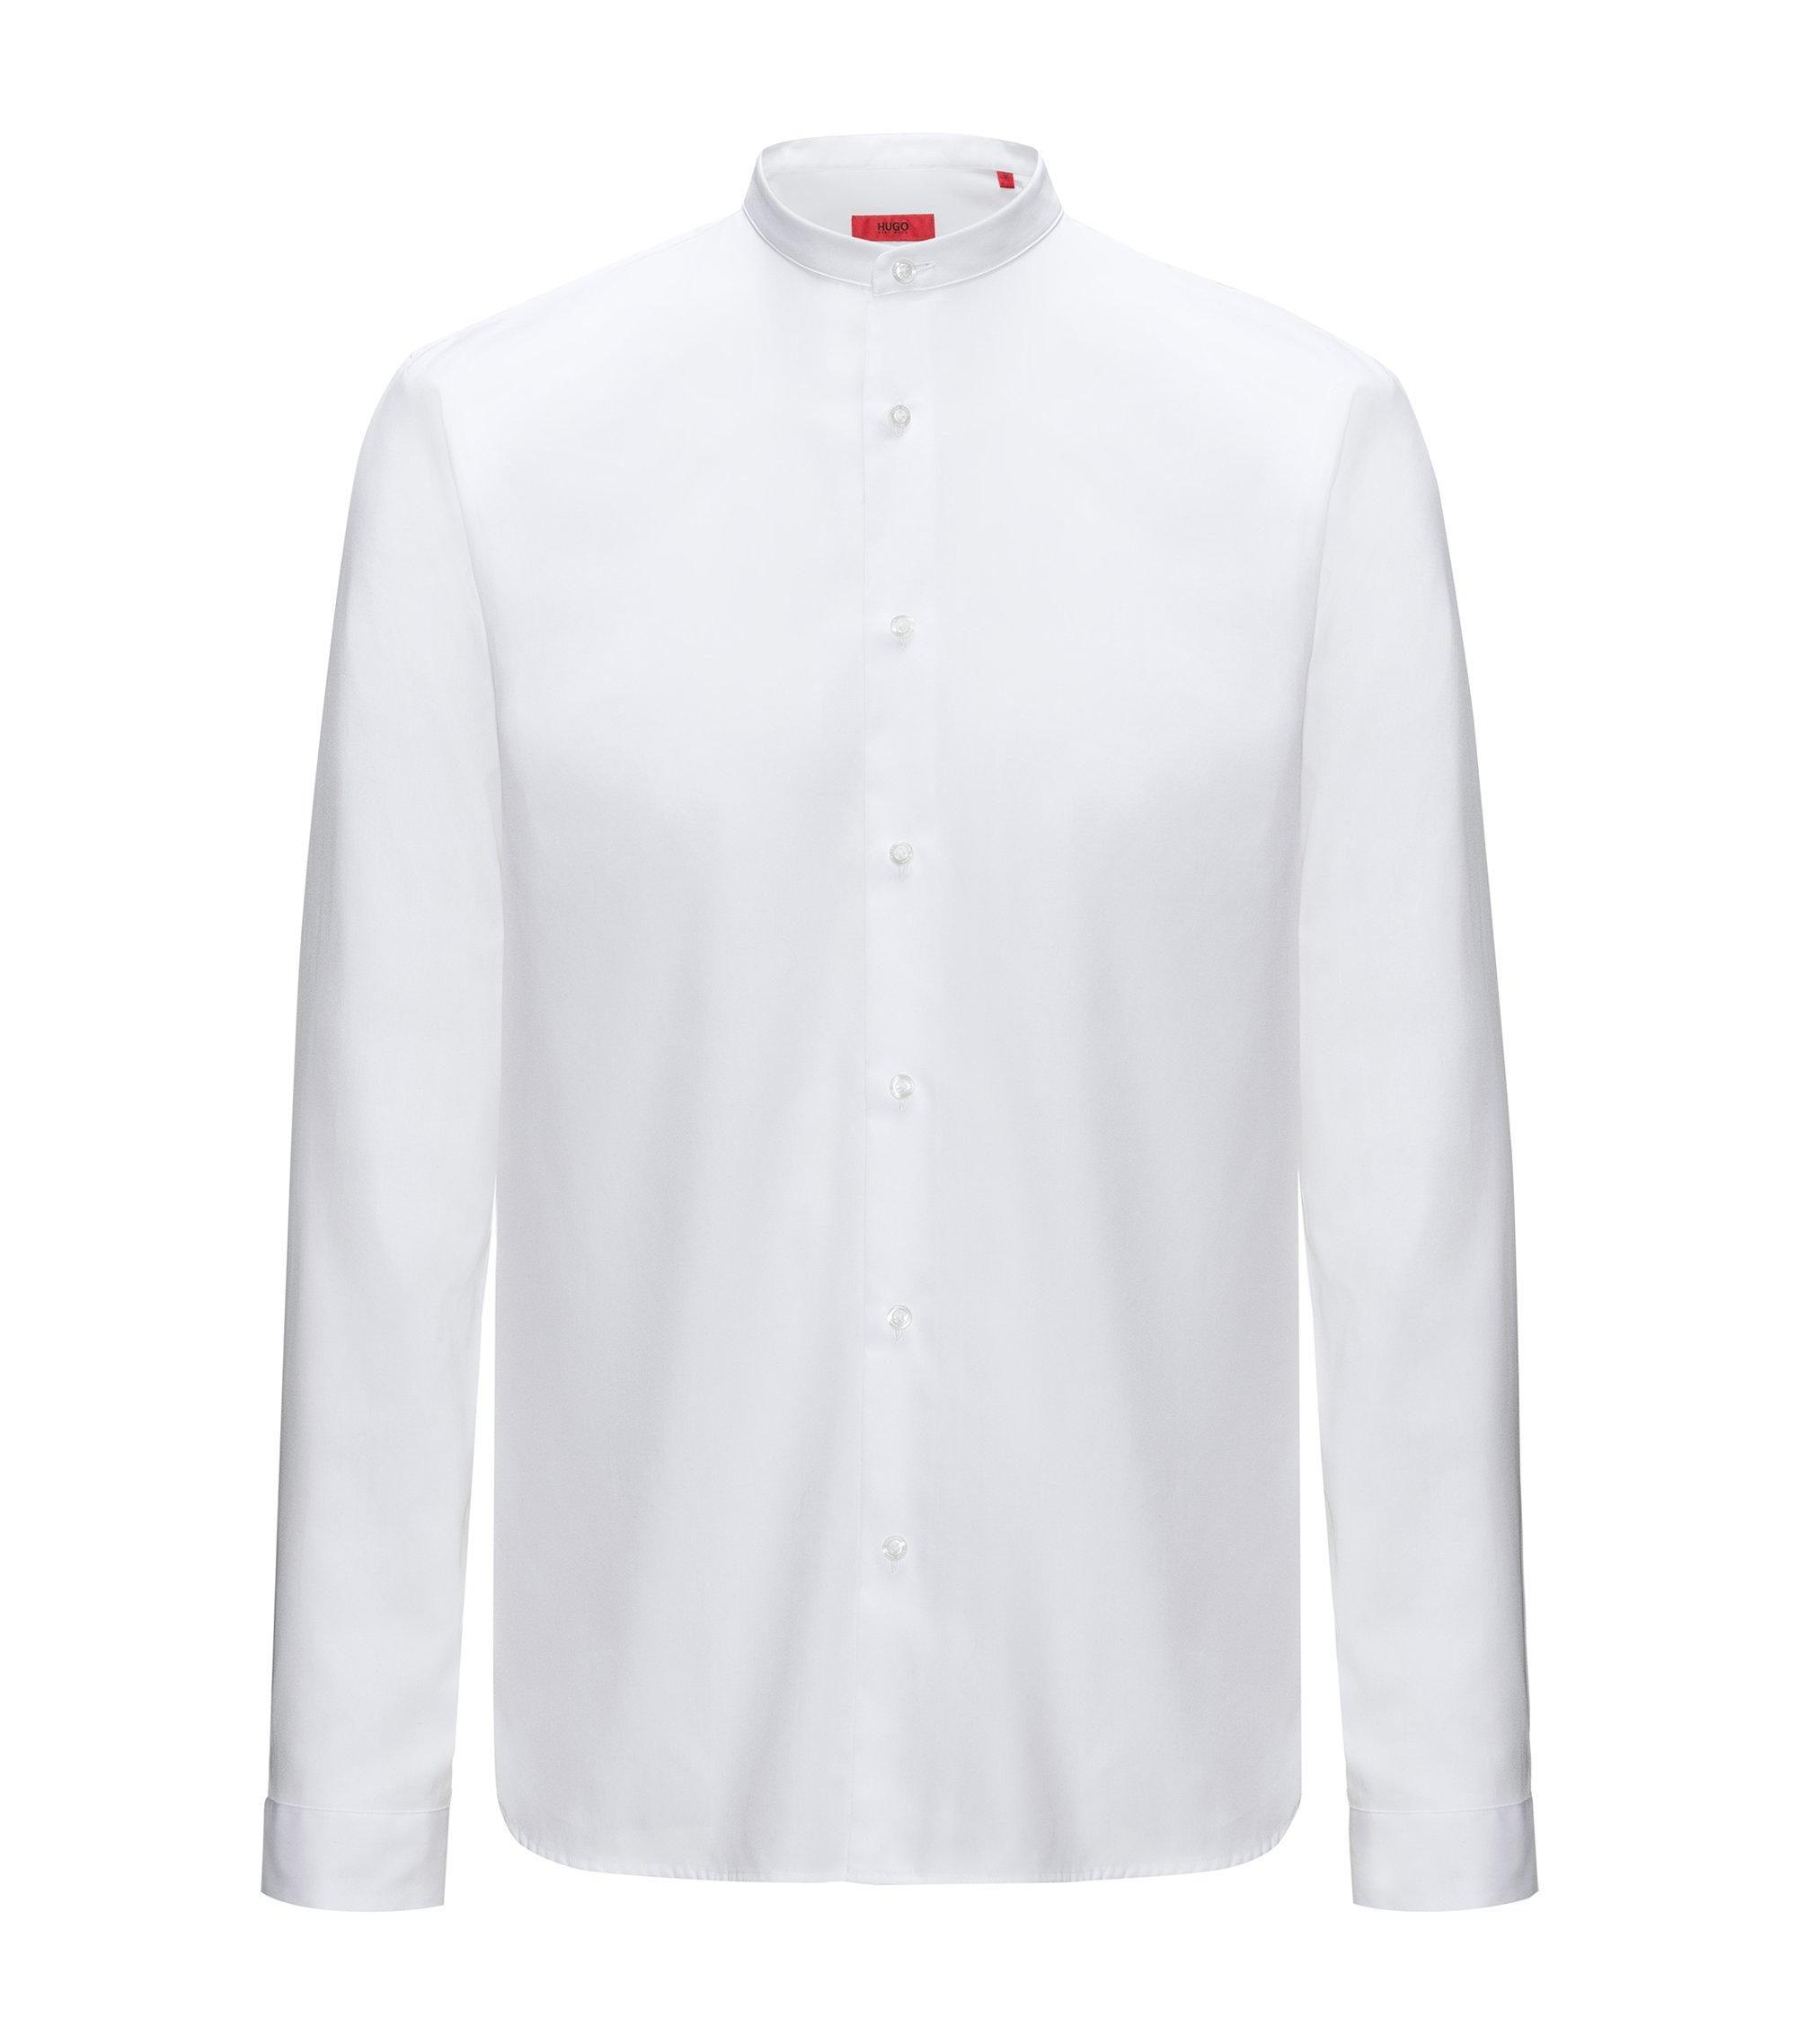 Chemise Relaxed Fit en coton à col mao, Blanc